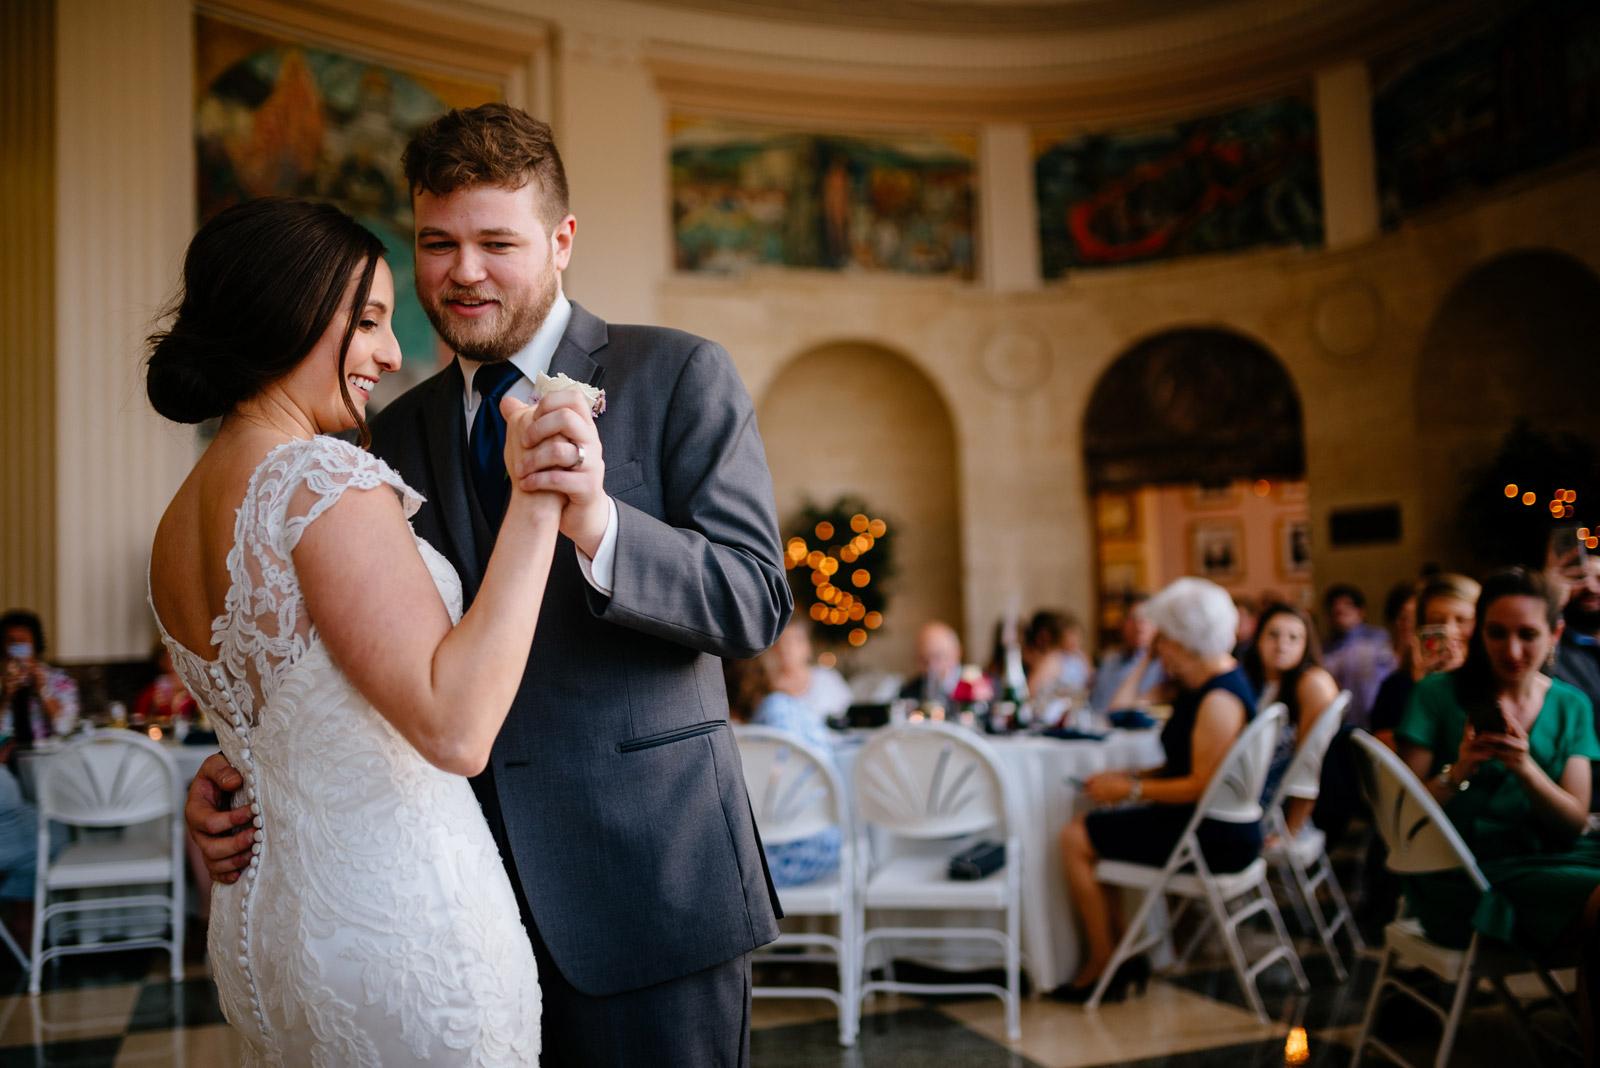 UC rotunda wedding reception first dance